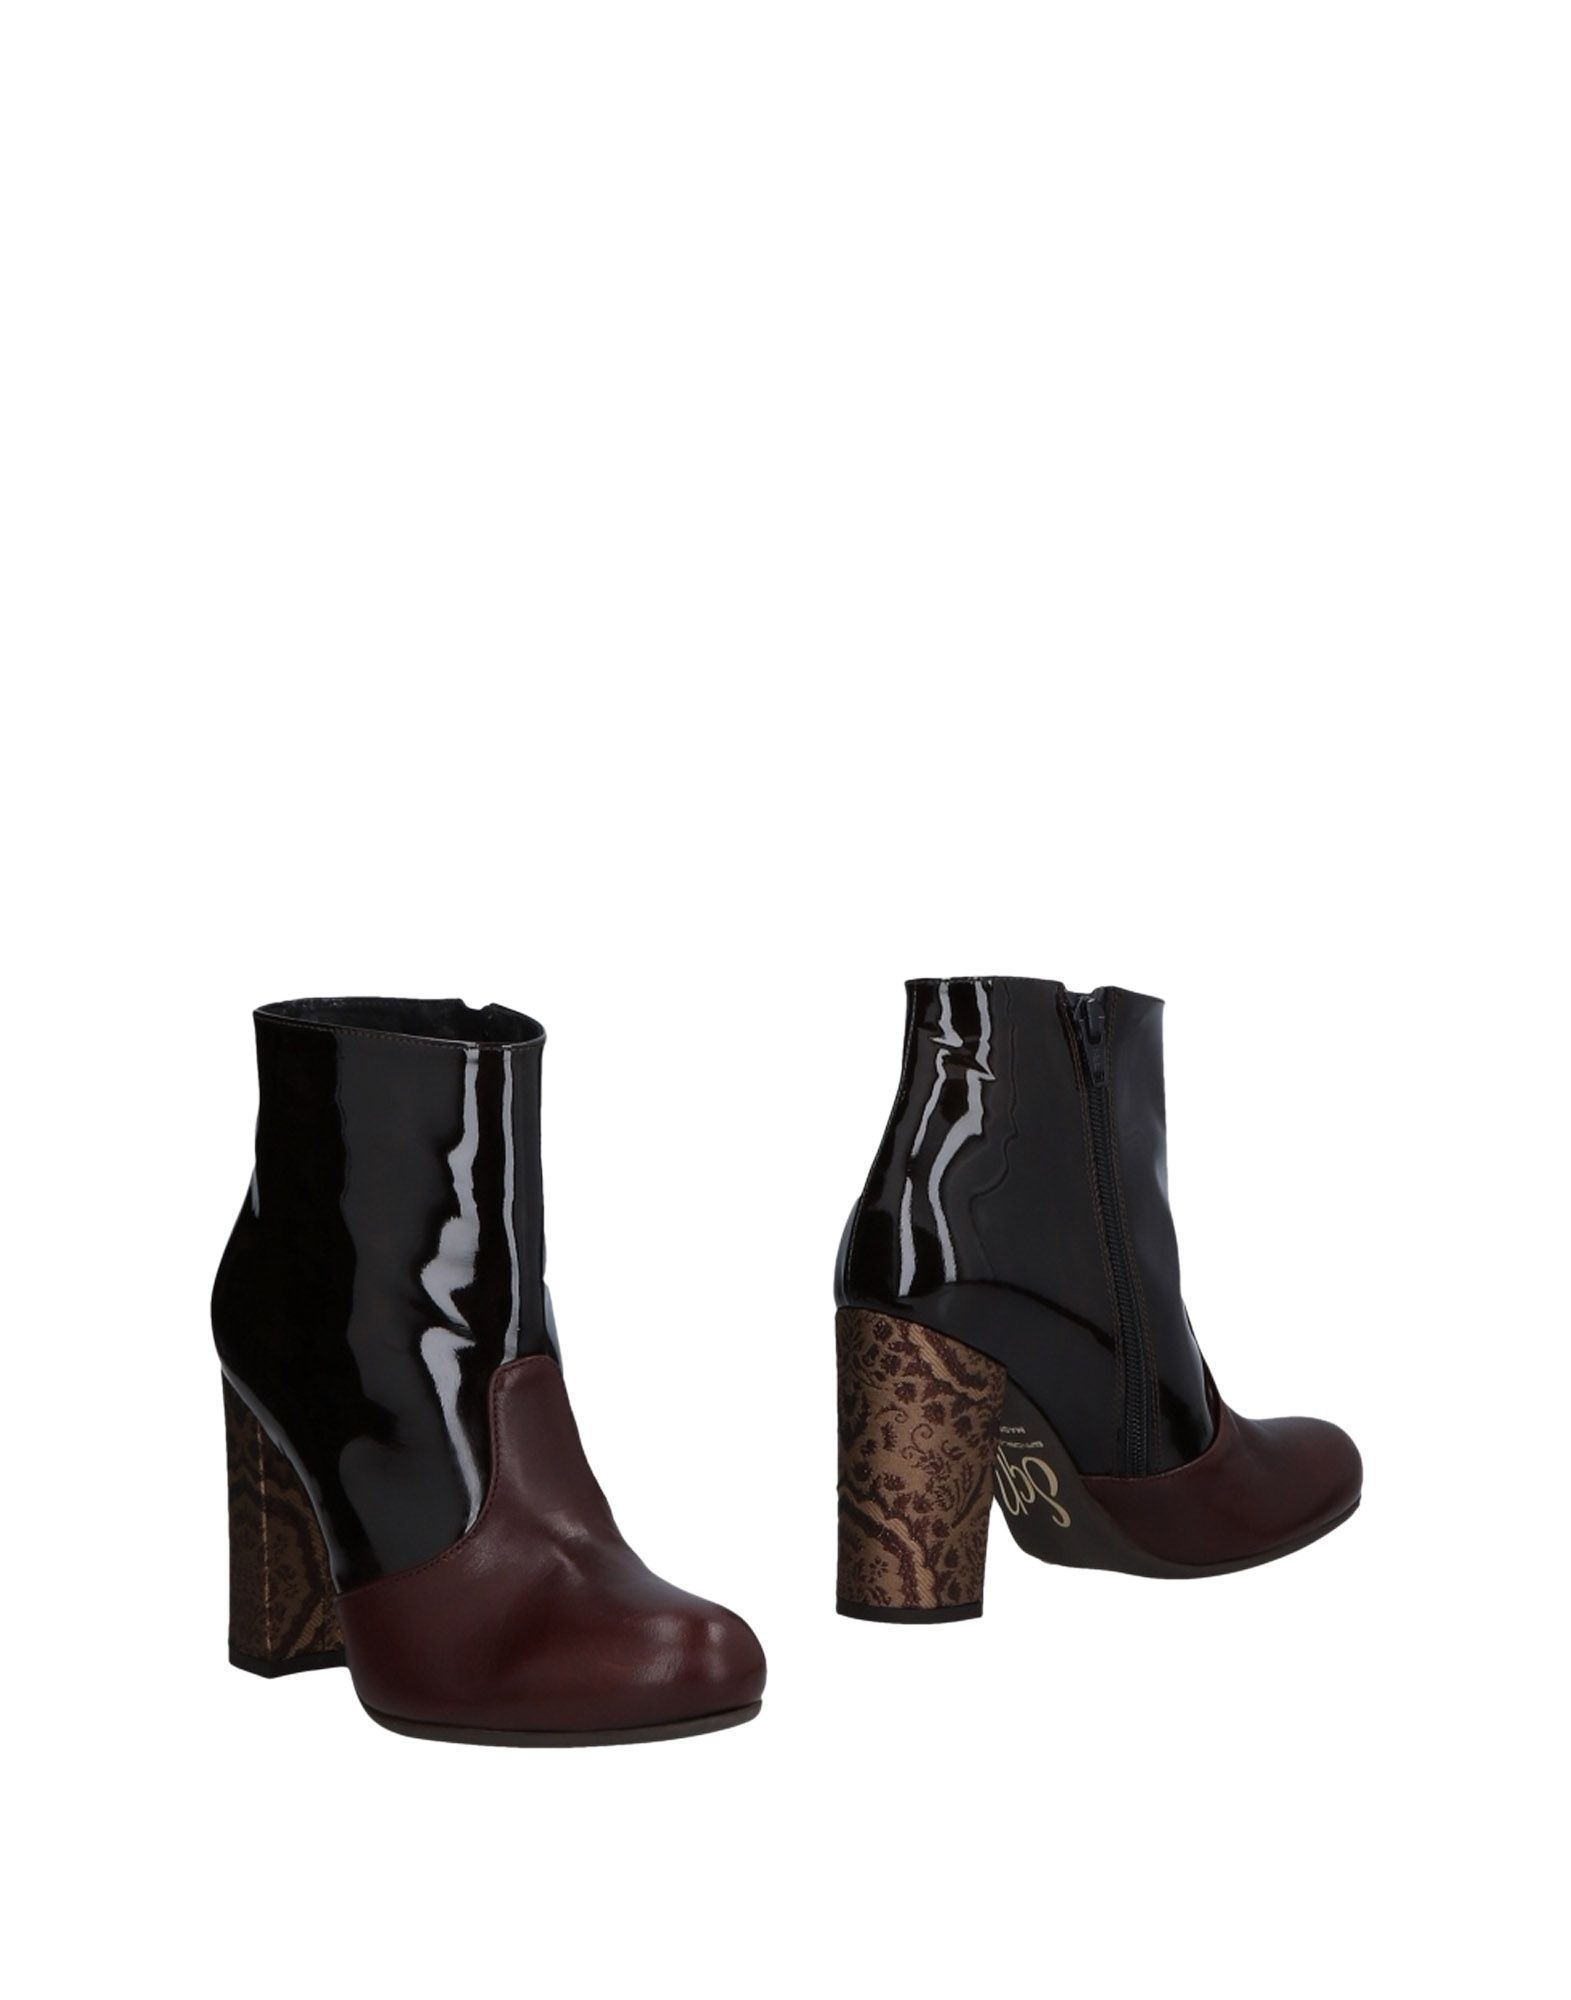 Sgn  Giancarlo Paoli Stiefelette Damen  Sgn 11475304UBGut aussehende strapazierfähige Schuhe 665e44